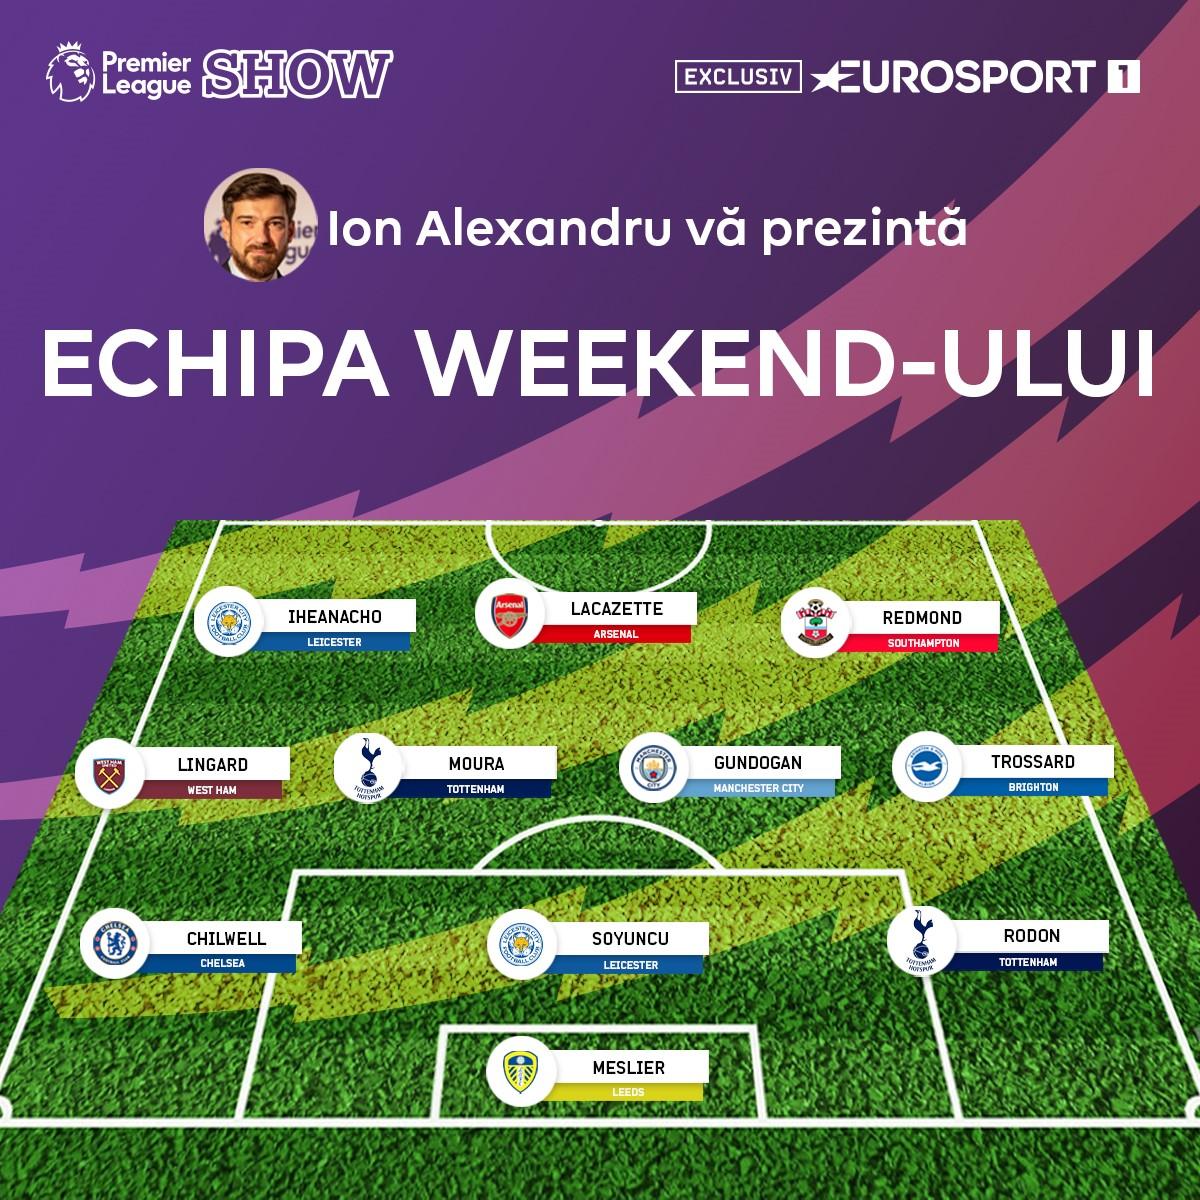 https://i.eurosport.com/2021/03/22/3016035.jpg